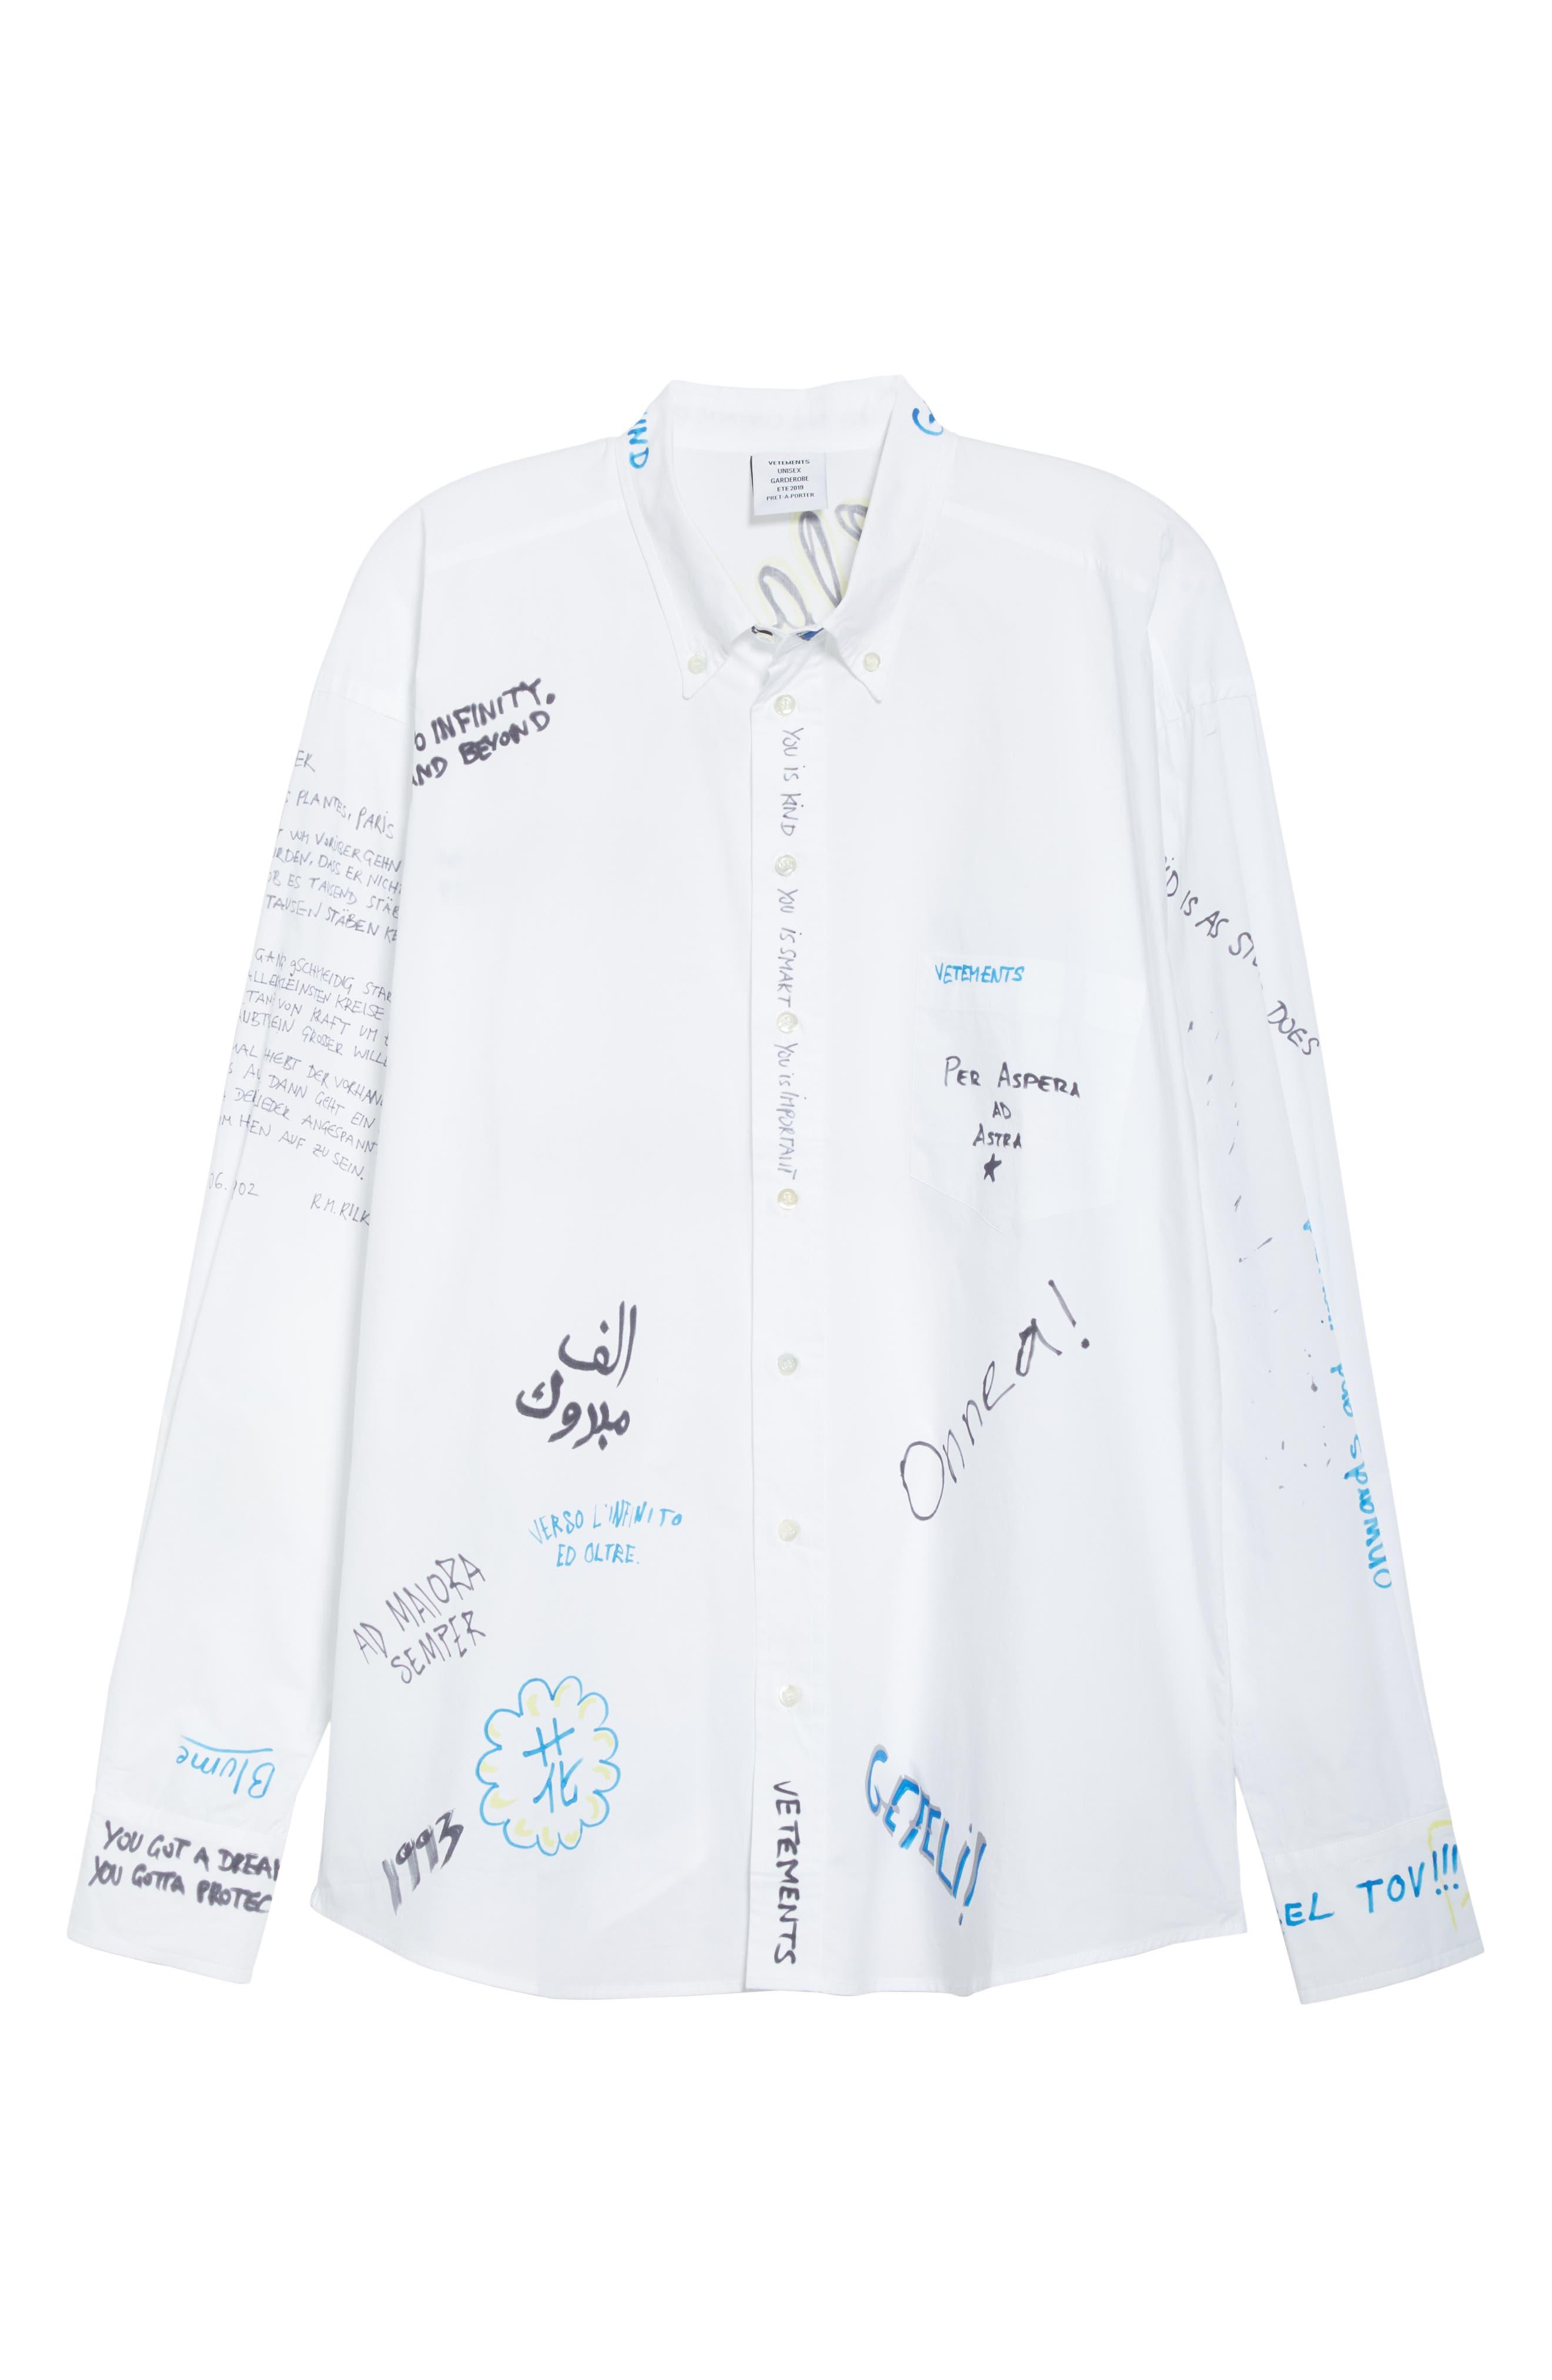 VETEMENTS, Scribble Print Oversize Shirt, Alternate thumbnail 6, color, WHITE